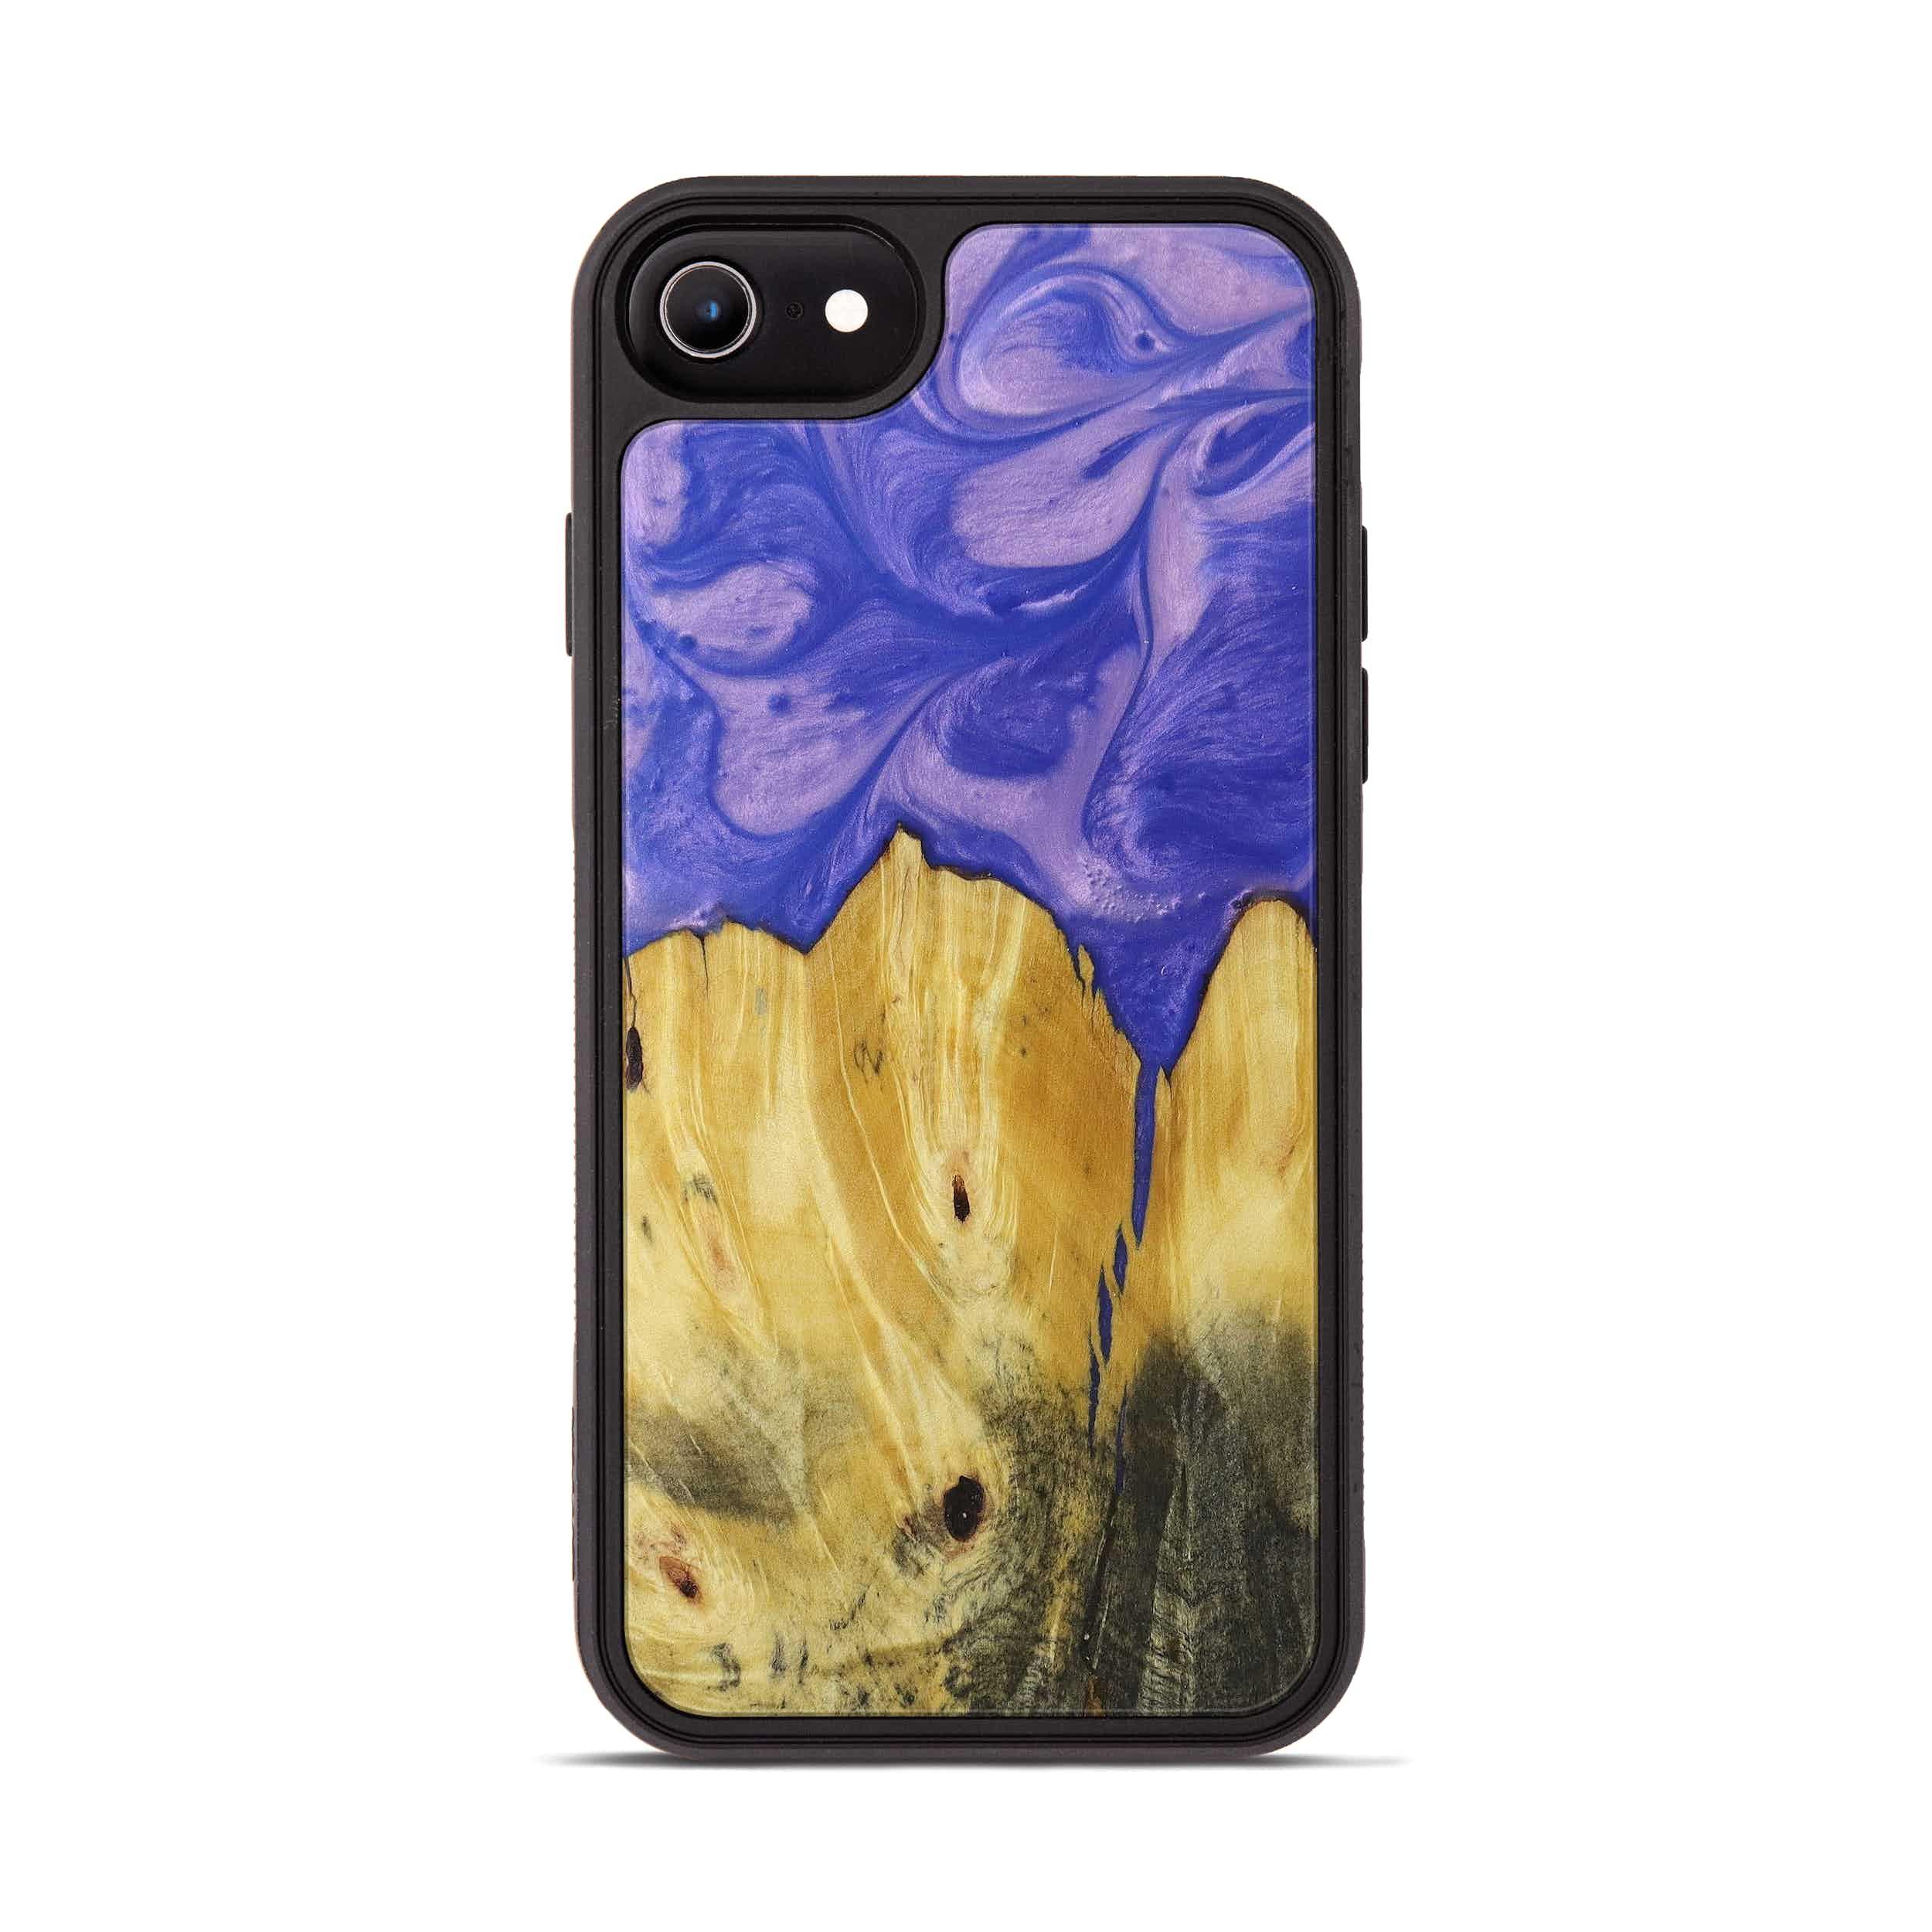 iPhone 6s Wood+Resin Phone Case - Dixie (Purple, 395917)